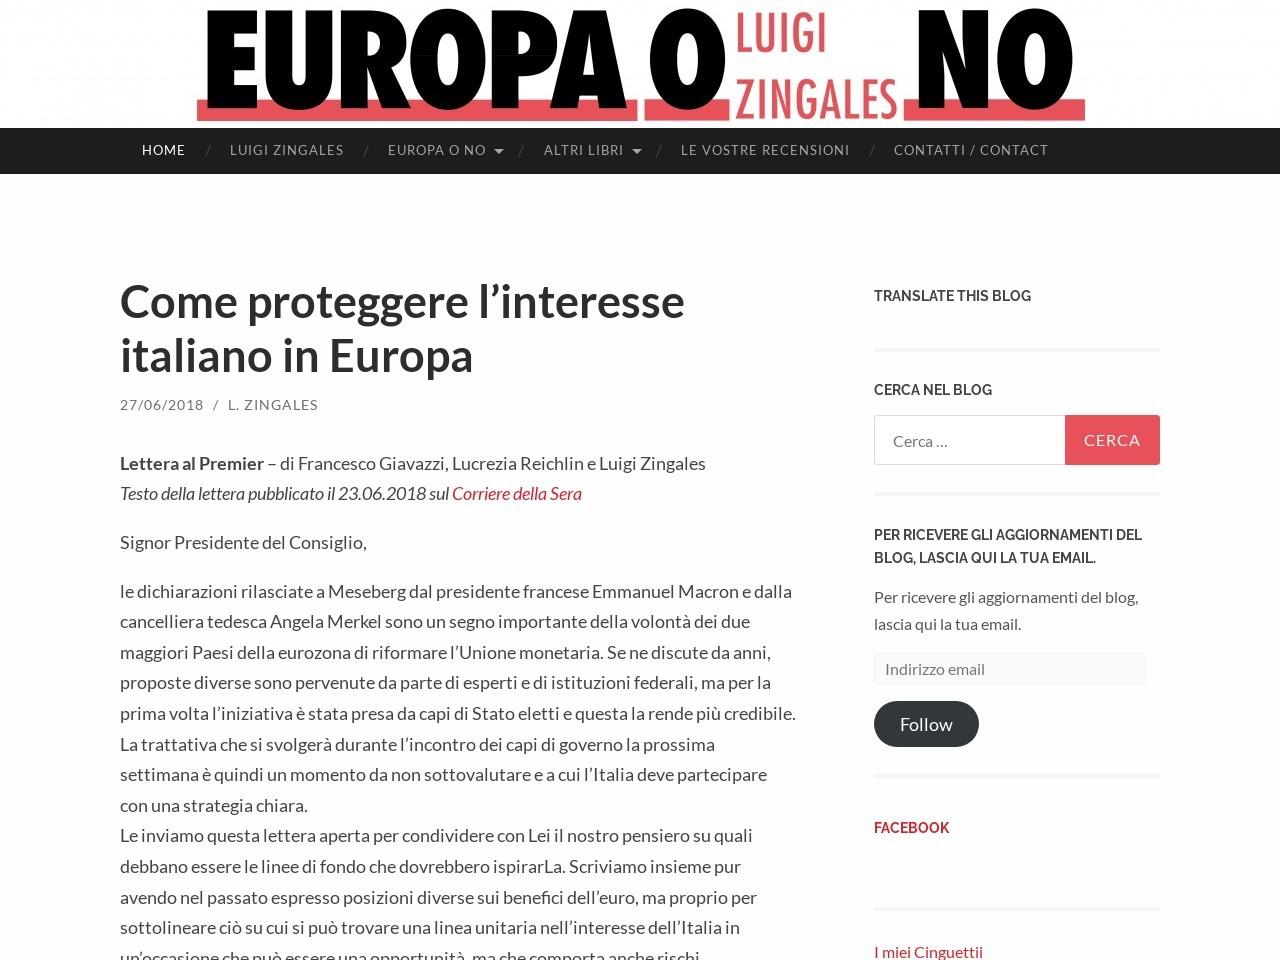 europa-o-no-luigi-zingales-blog